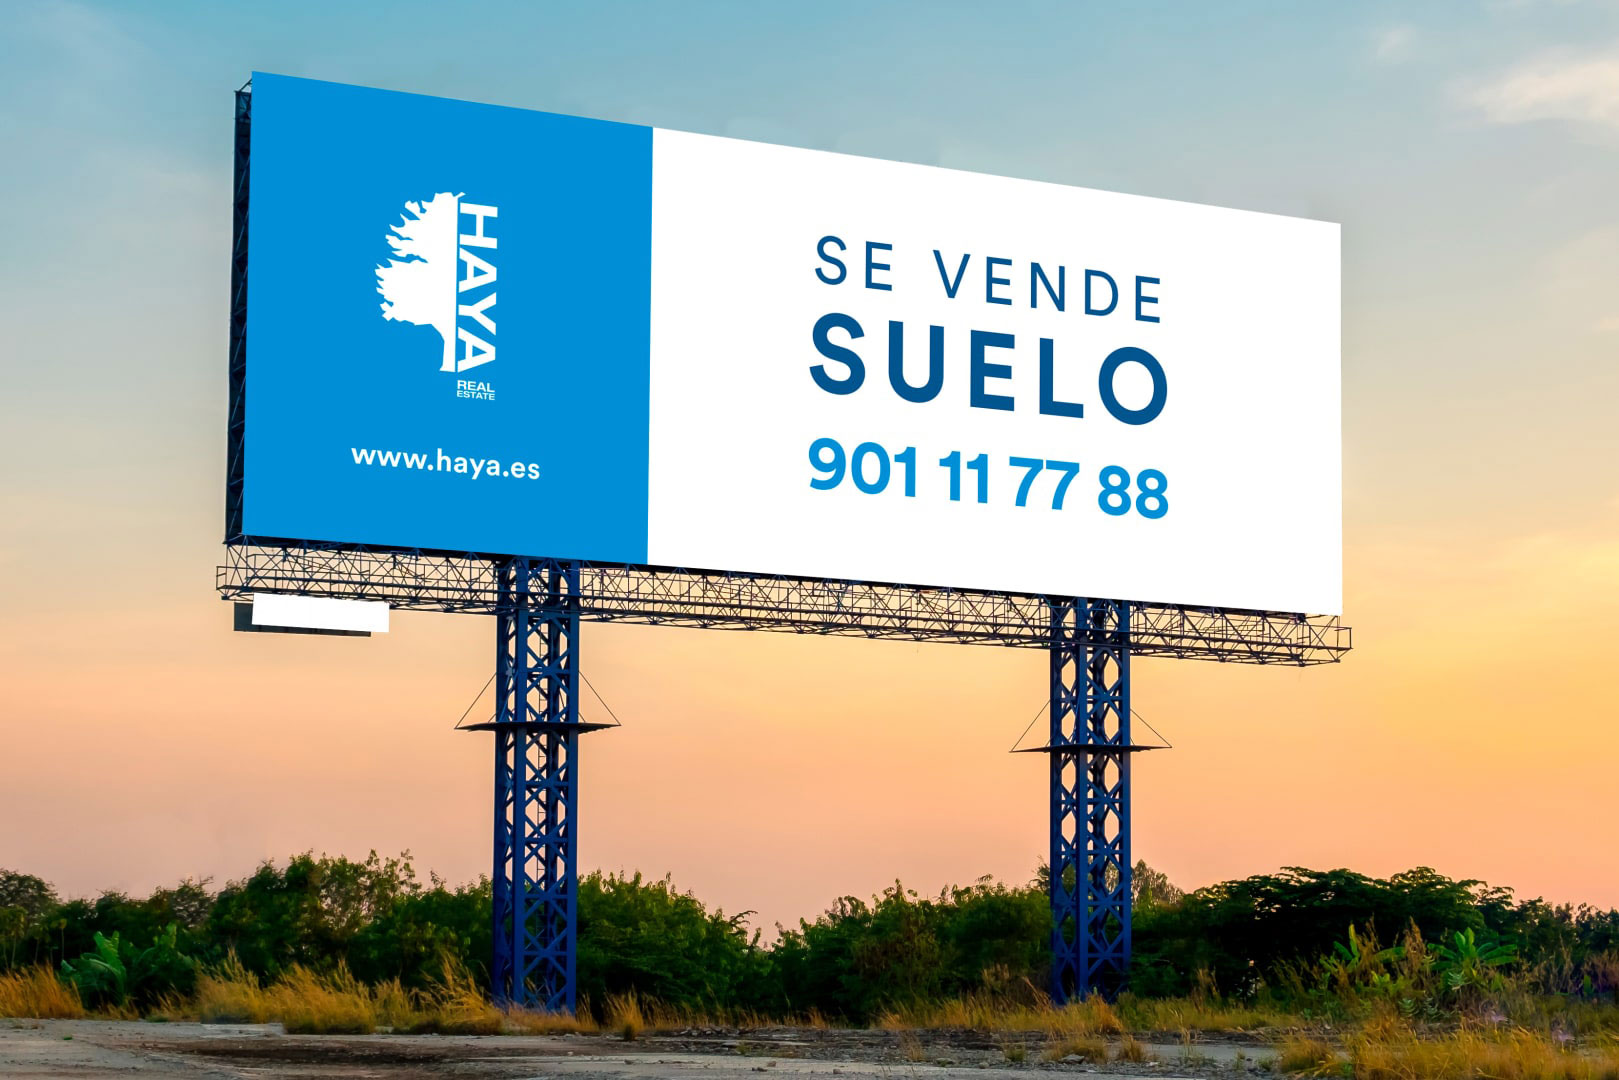 Suelo en venta en Ajofrín, Toledo, Calle Saui-5a, 405.908 €, 31475 m2